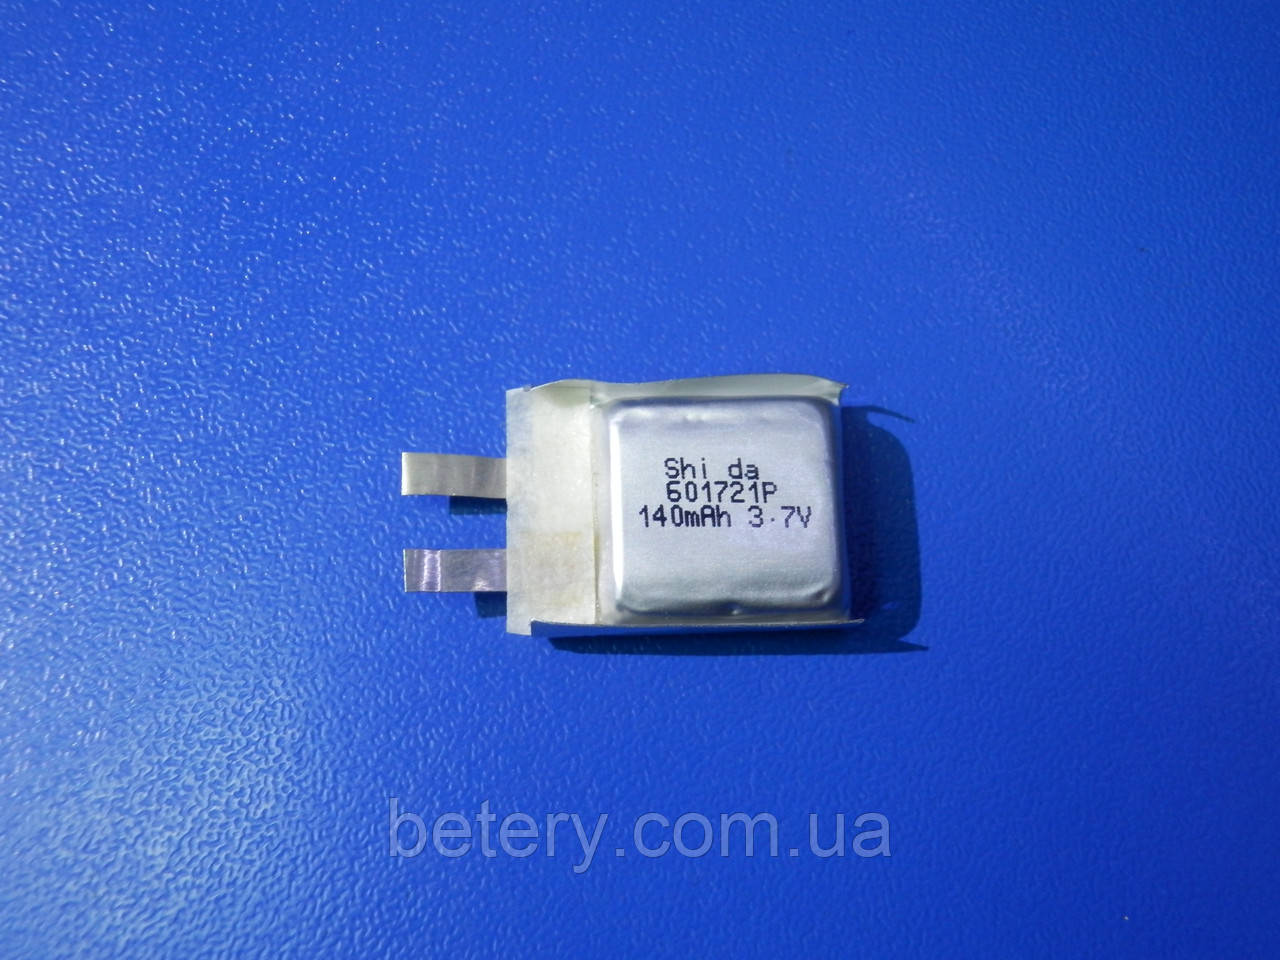 Аккумулятор Li-pol Shida 601721P 3,7v 140mAh